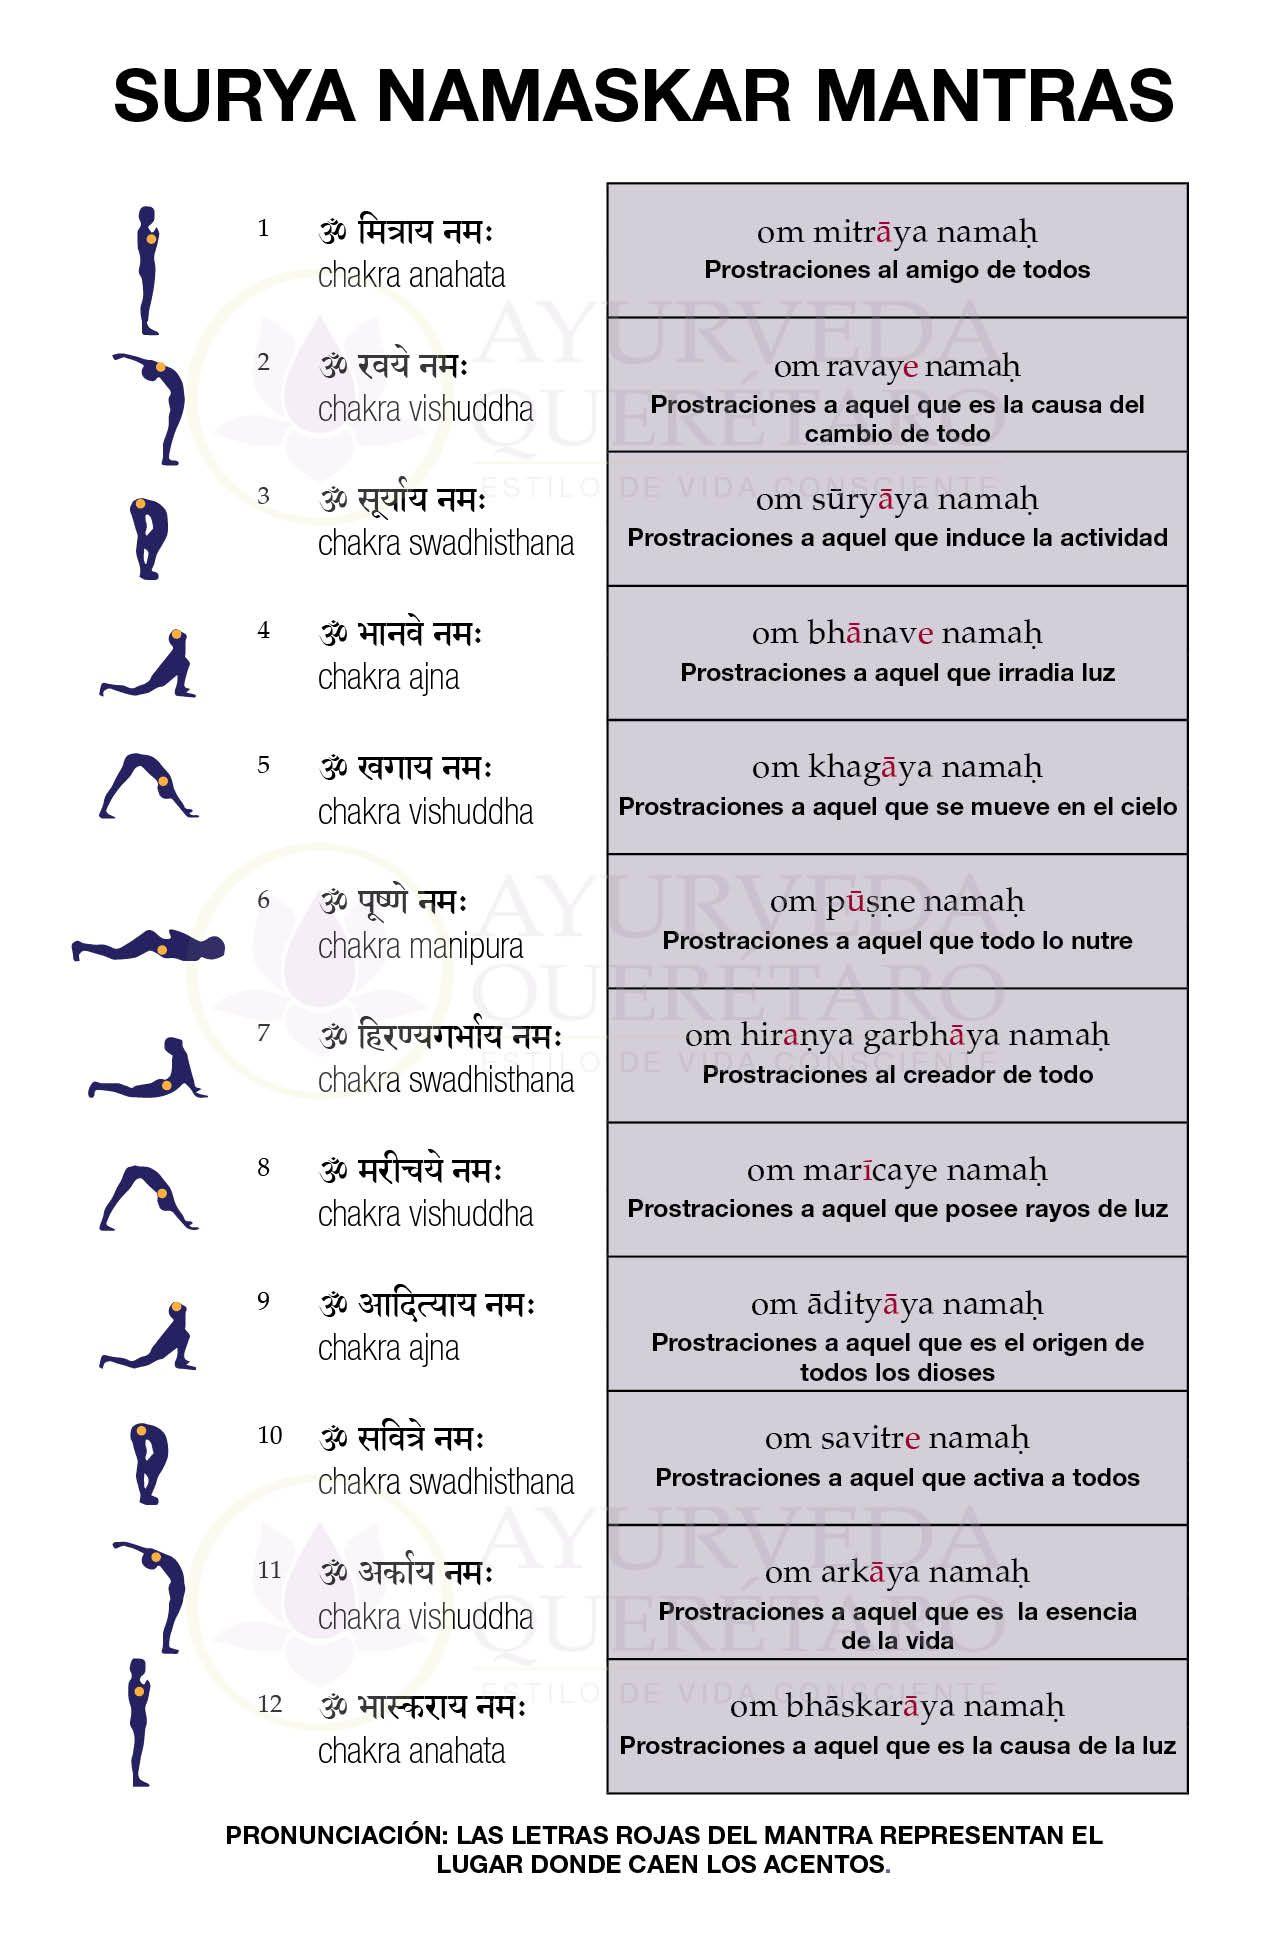 Surya Namaskar Mantras Yoga Mantras Mantras Yoga Benefits